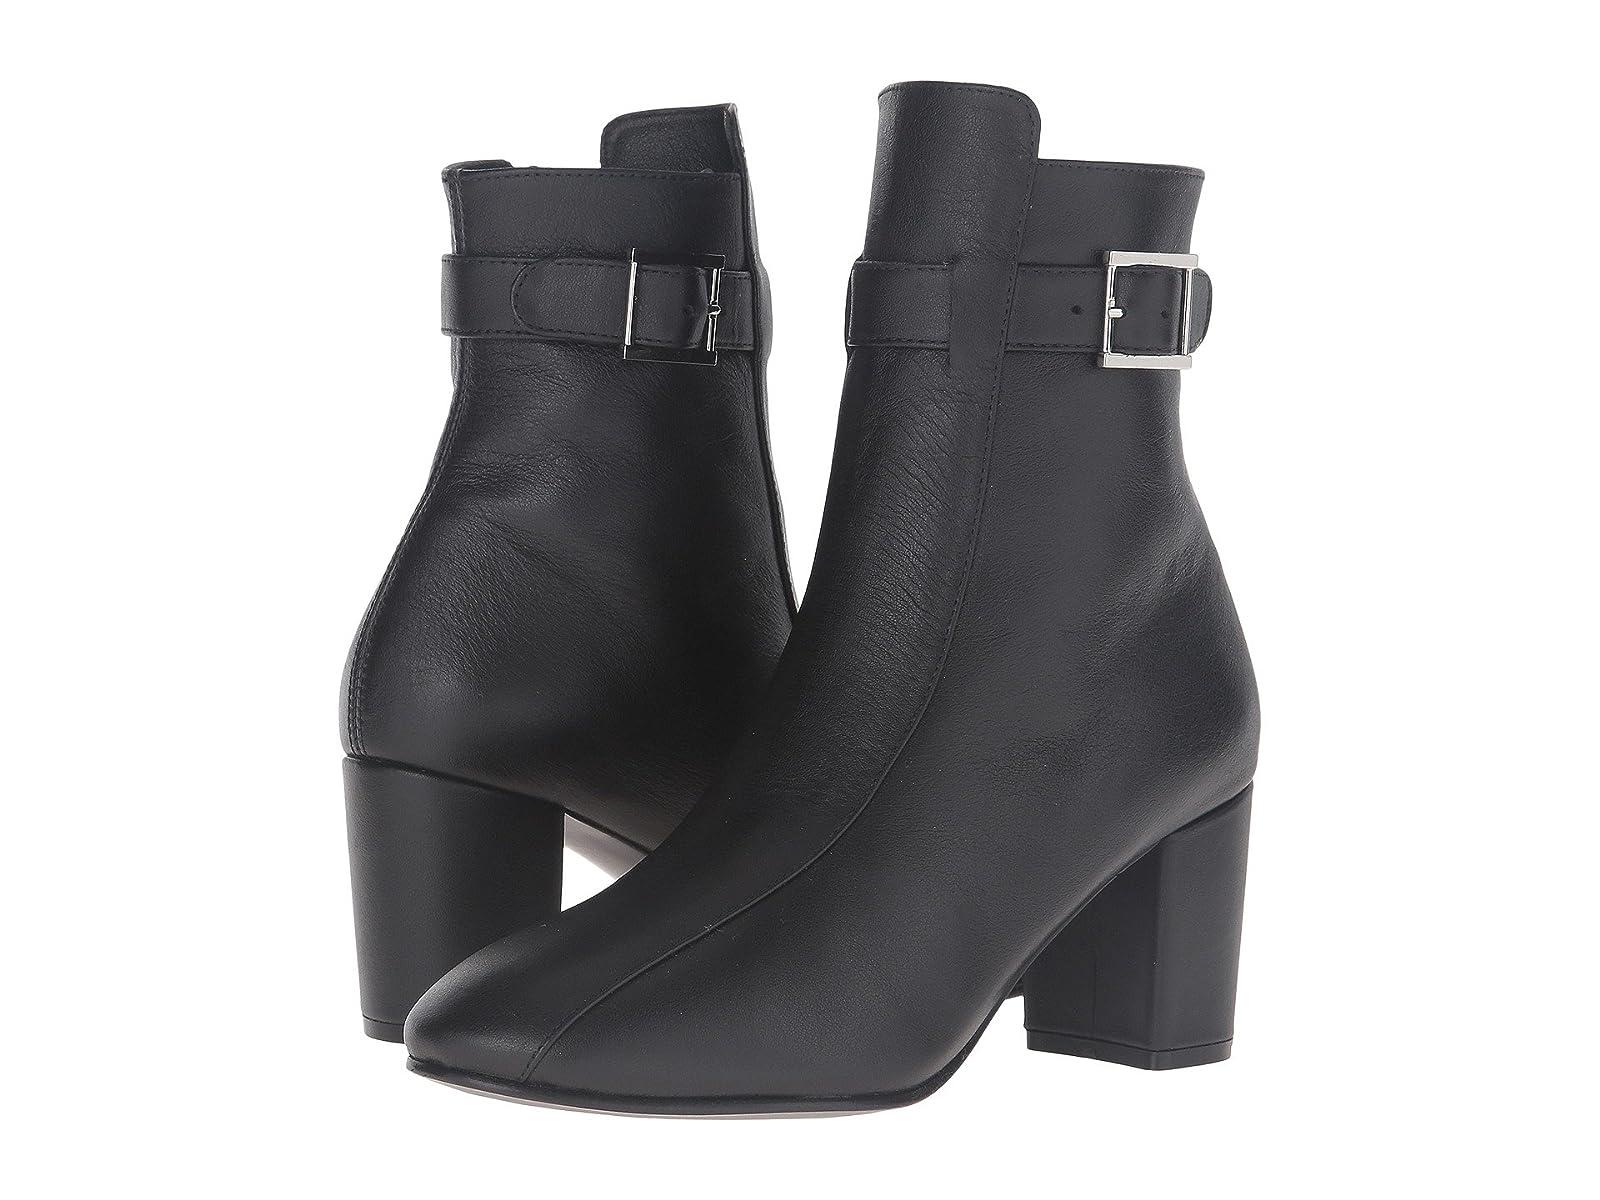 NewbarK Sabrina BootCheap and distinctive eye-catching shoes